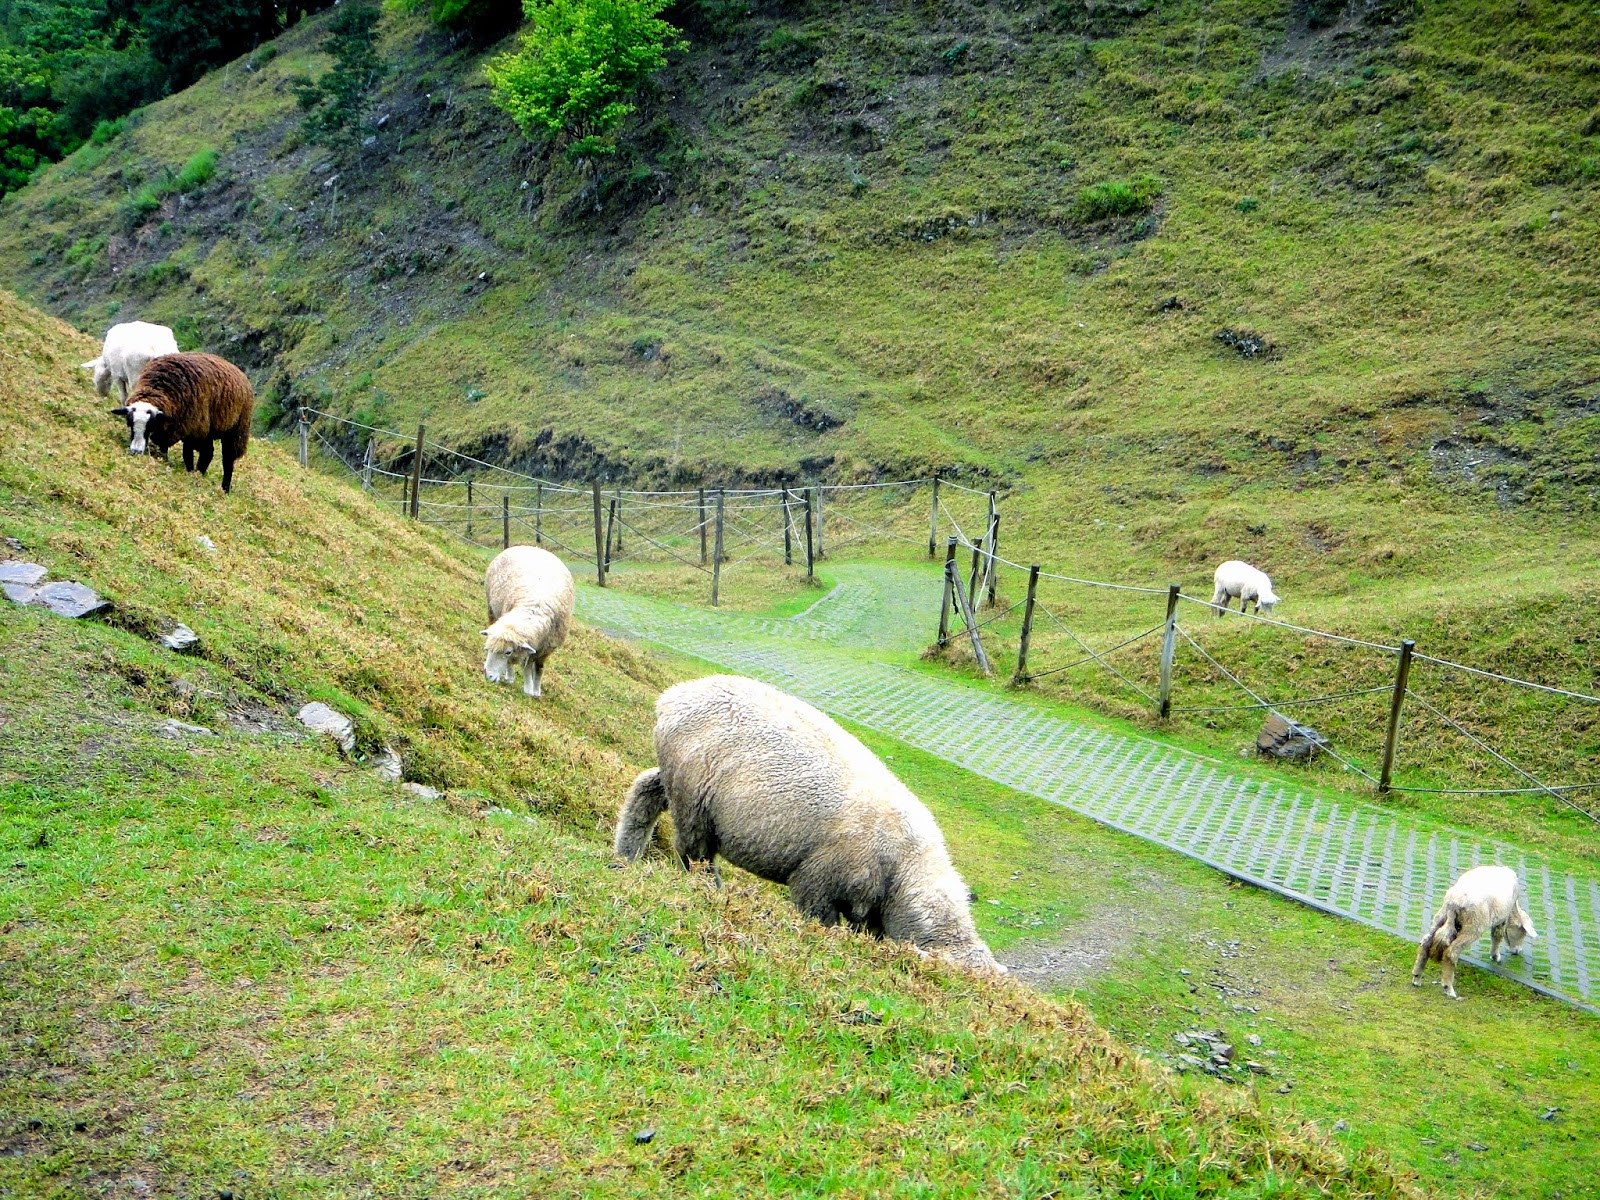 Lambs at Green Green Grassland Cingjing Farm